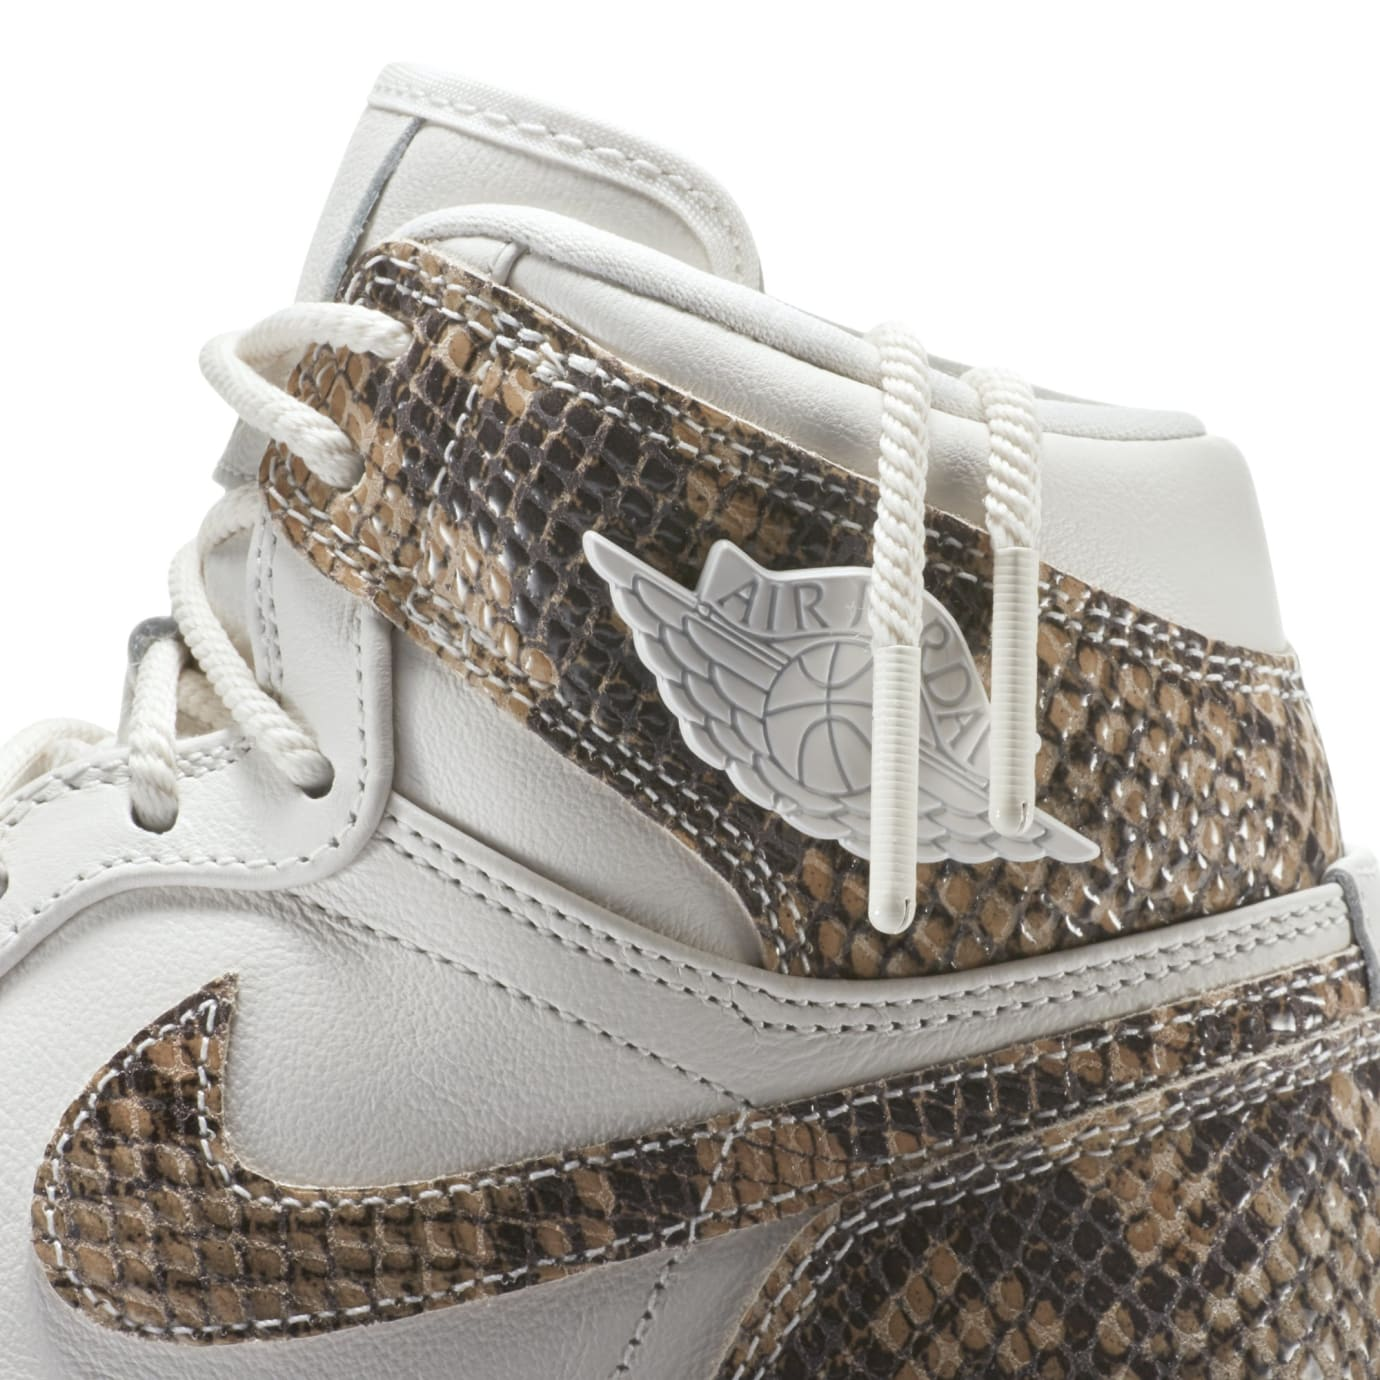 Image via Nike Air Jordan 1 Retro High Premium Women s Snake  Phantom White   AH7389-004 3cb86dc4d